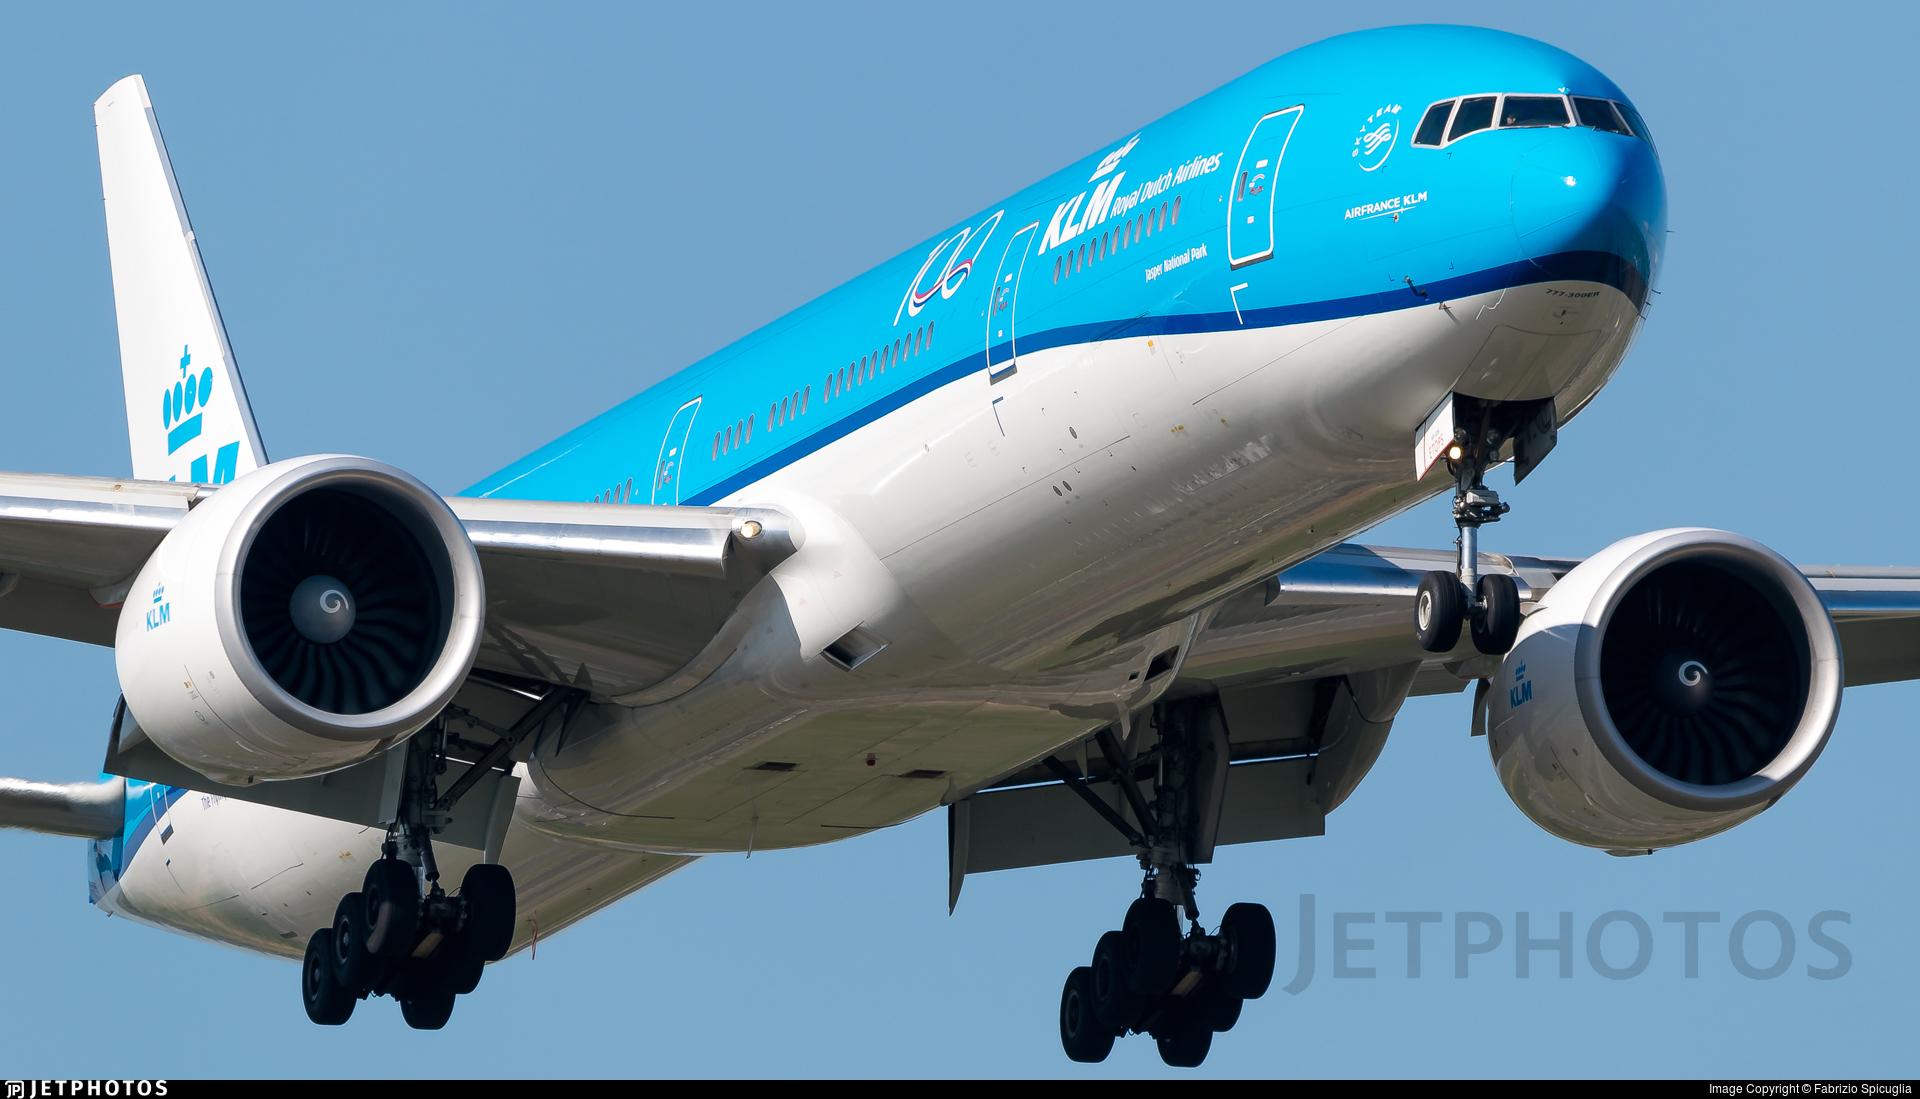 PH-BVP - Boeing 777-306ER - KLM Royal Dutch Airlines